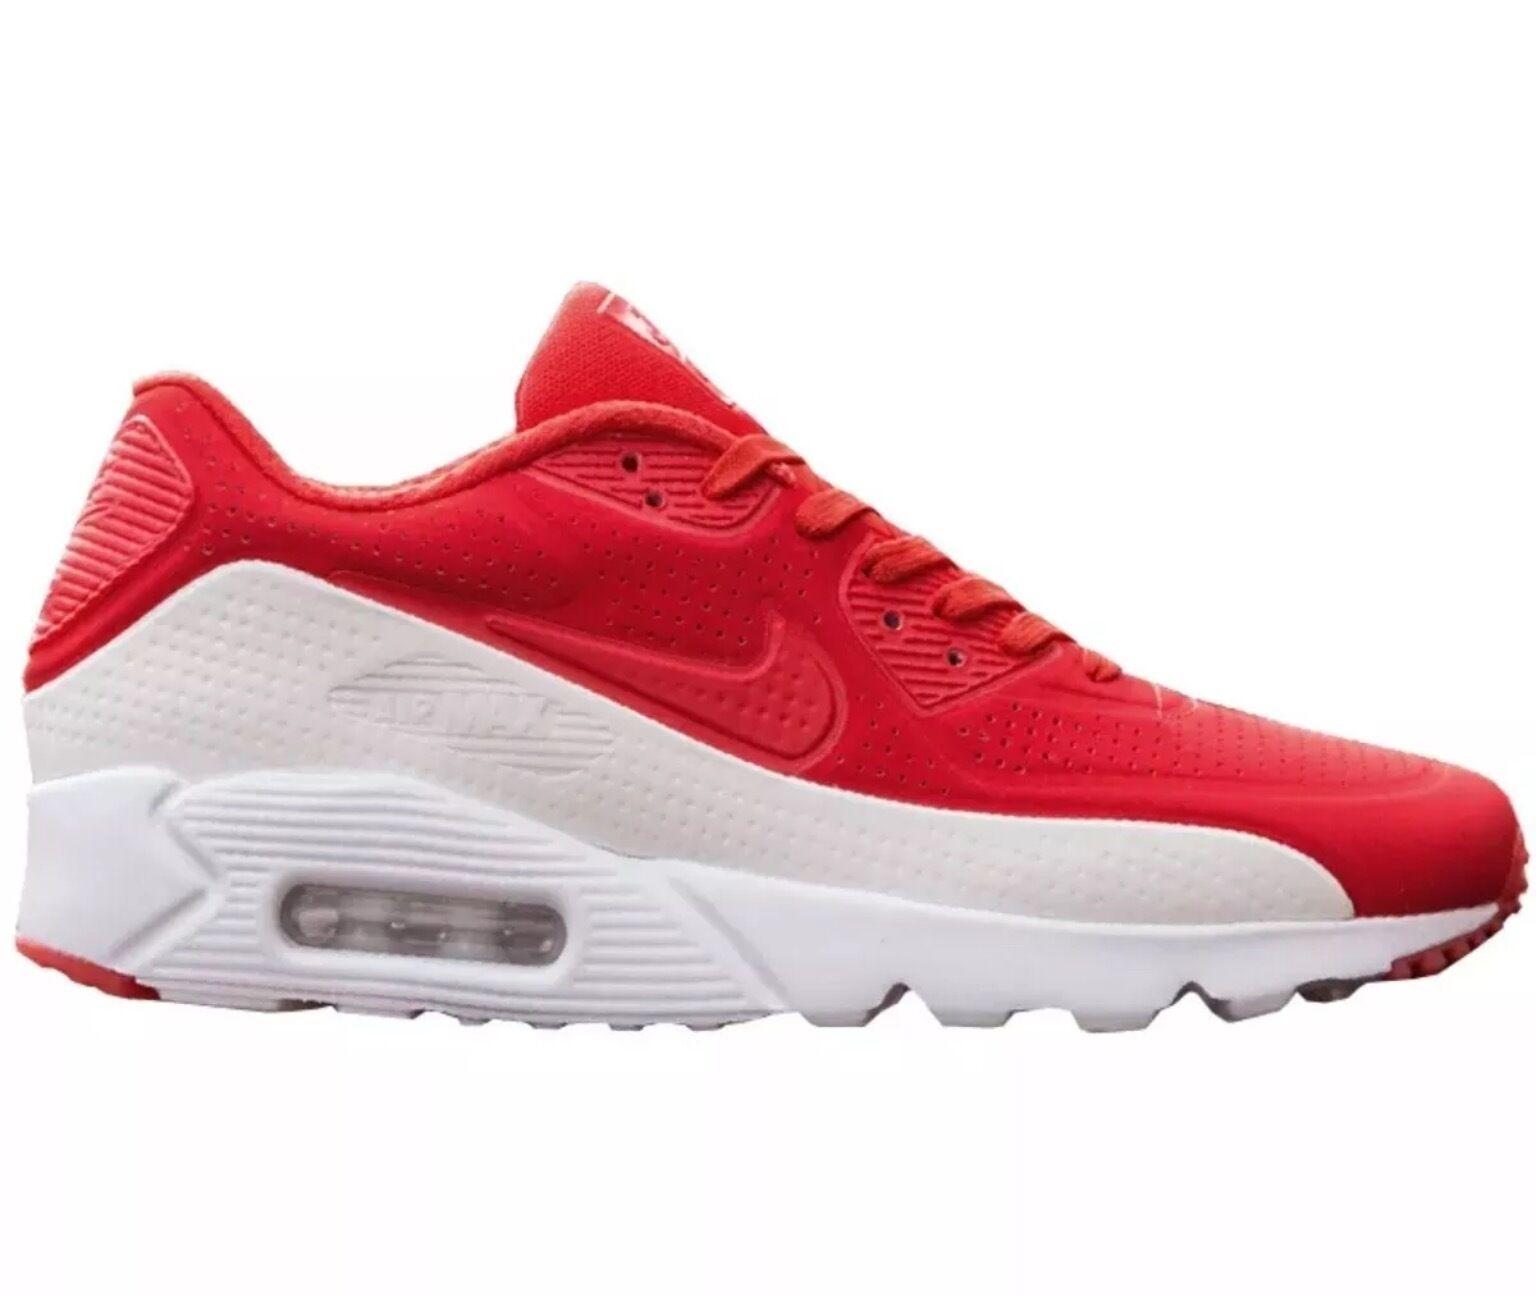 Nike air max moir 90 ultra moir max luce cremisi / red-white Uomo dimensioni (819477-611) e11e07